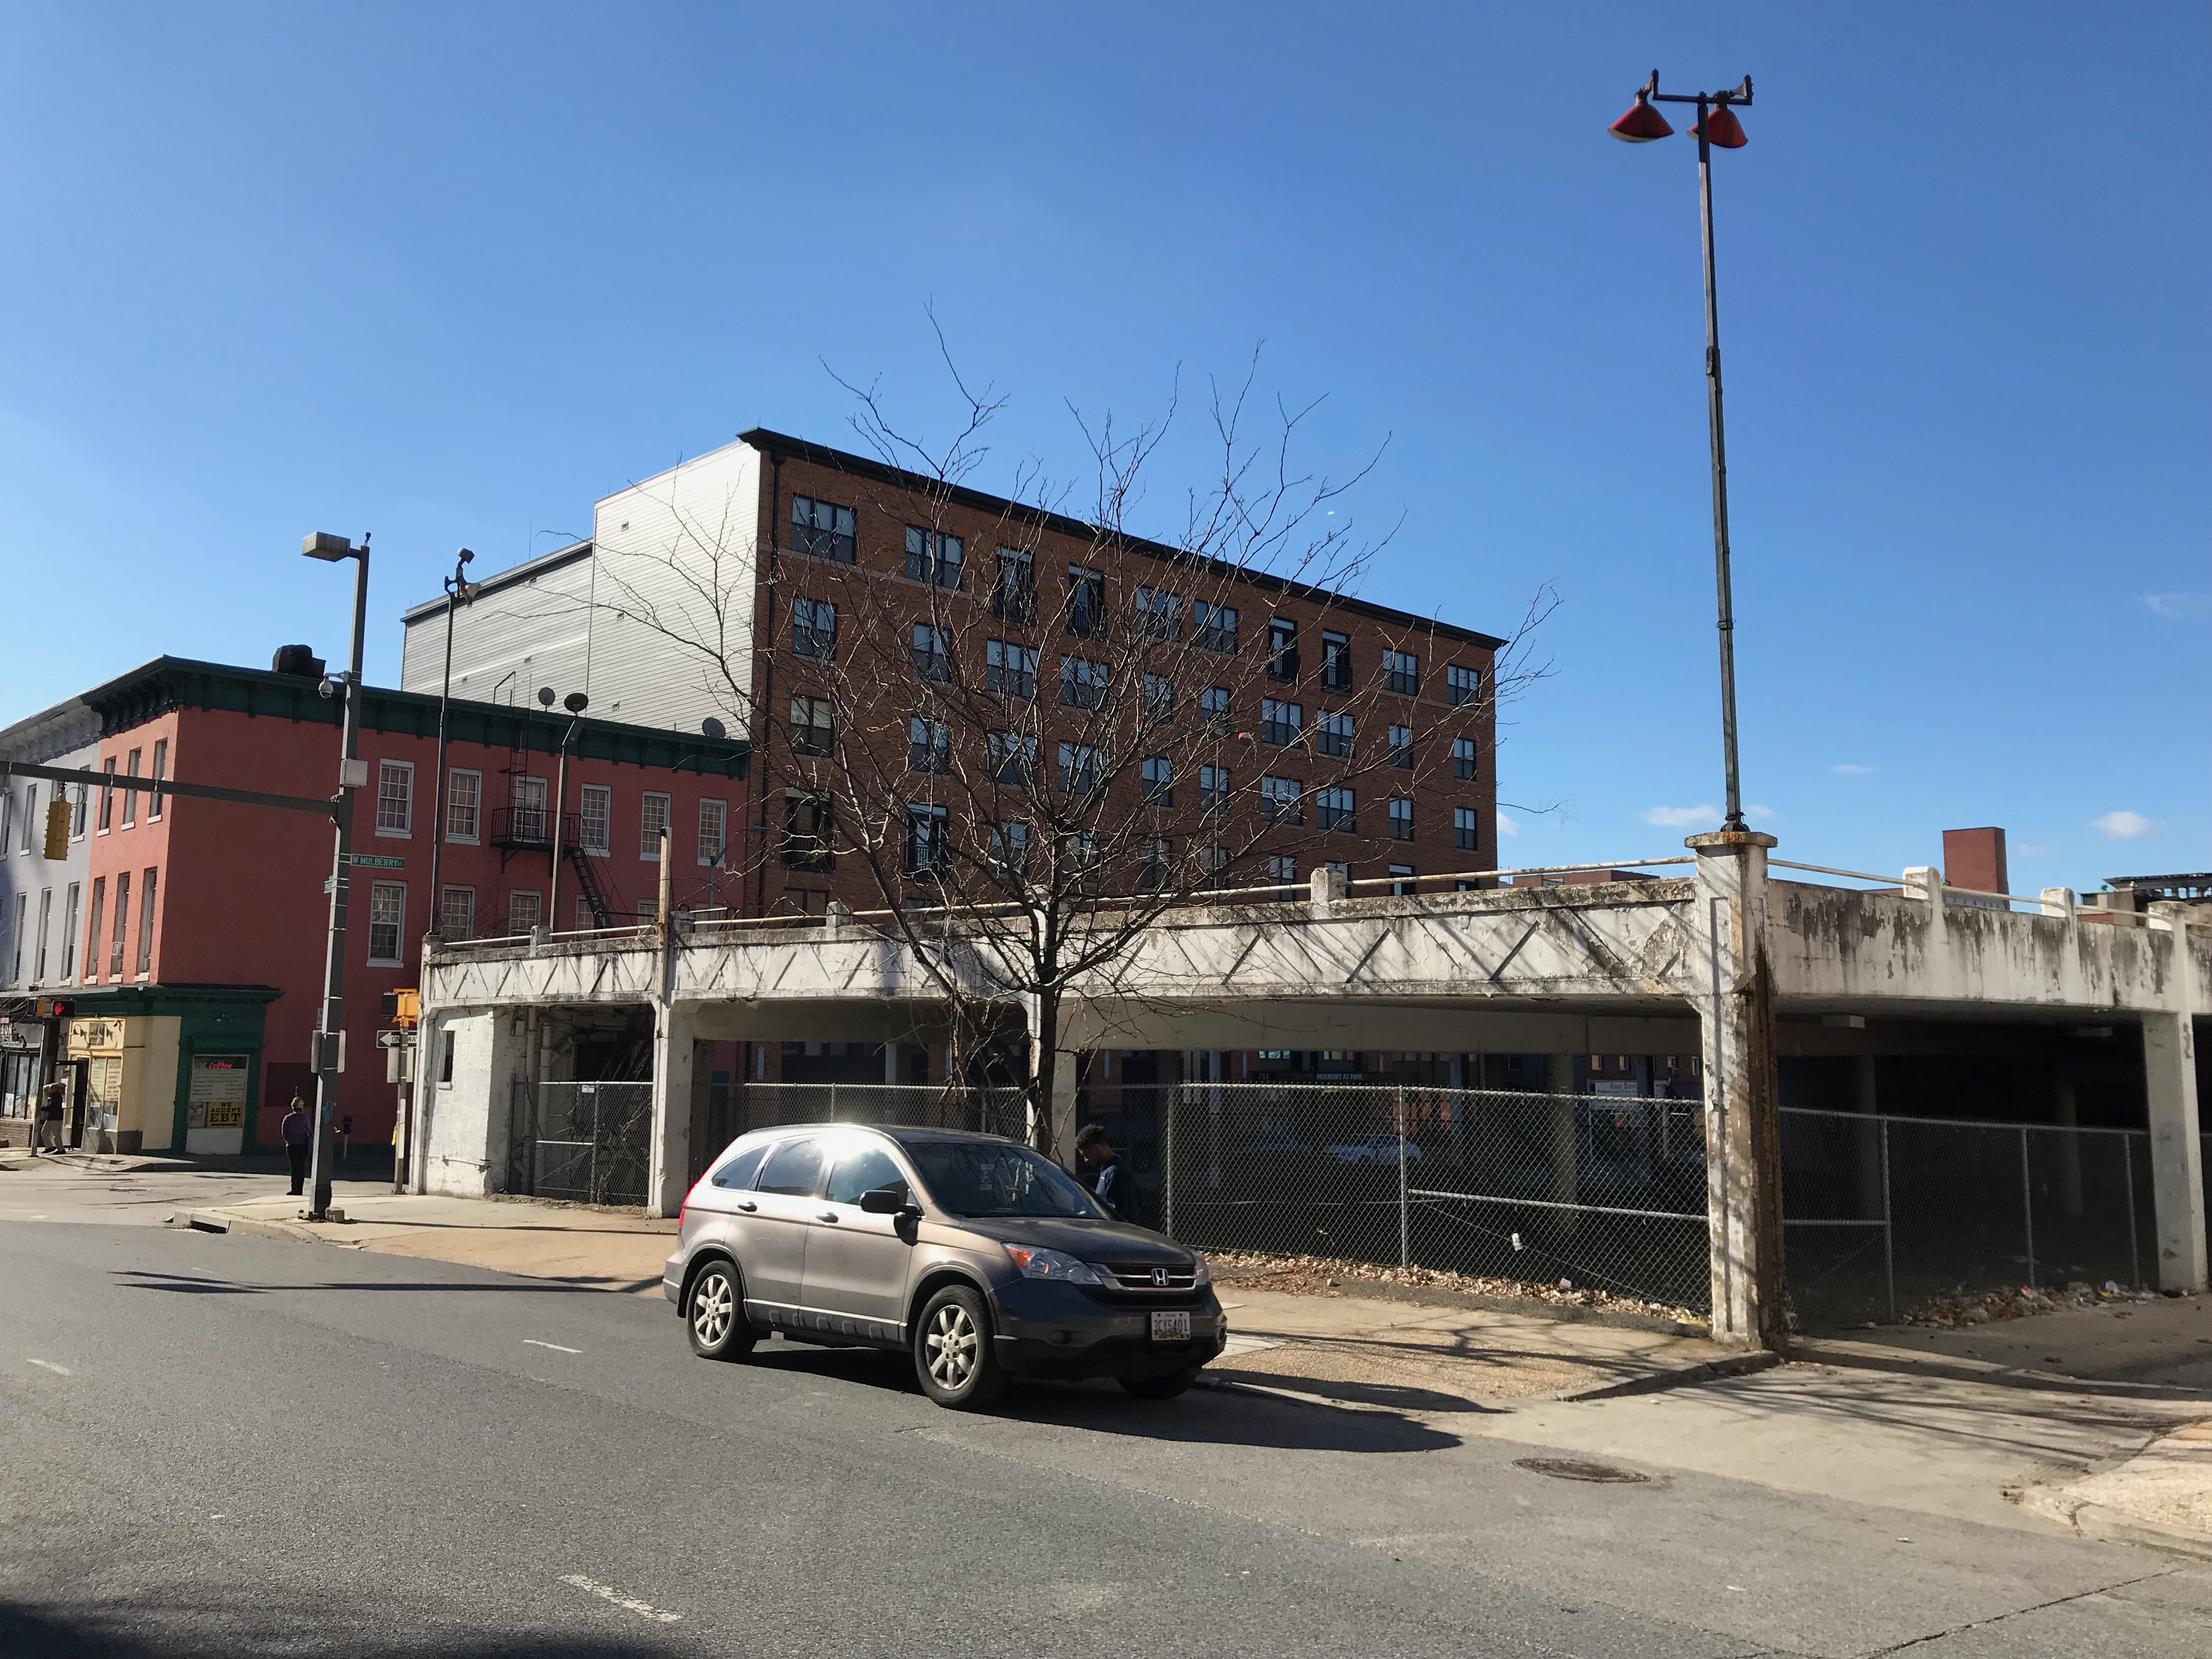 Parking structure, 400 park avenue, baltimore, md 21201 photo